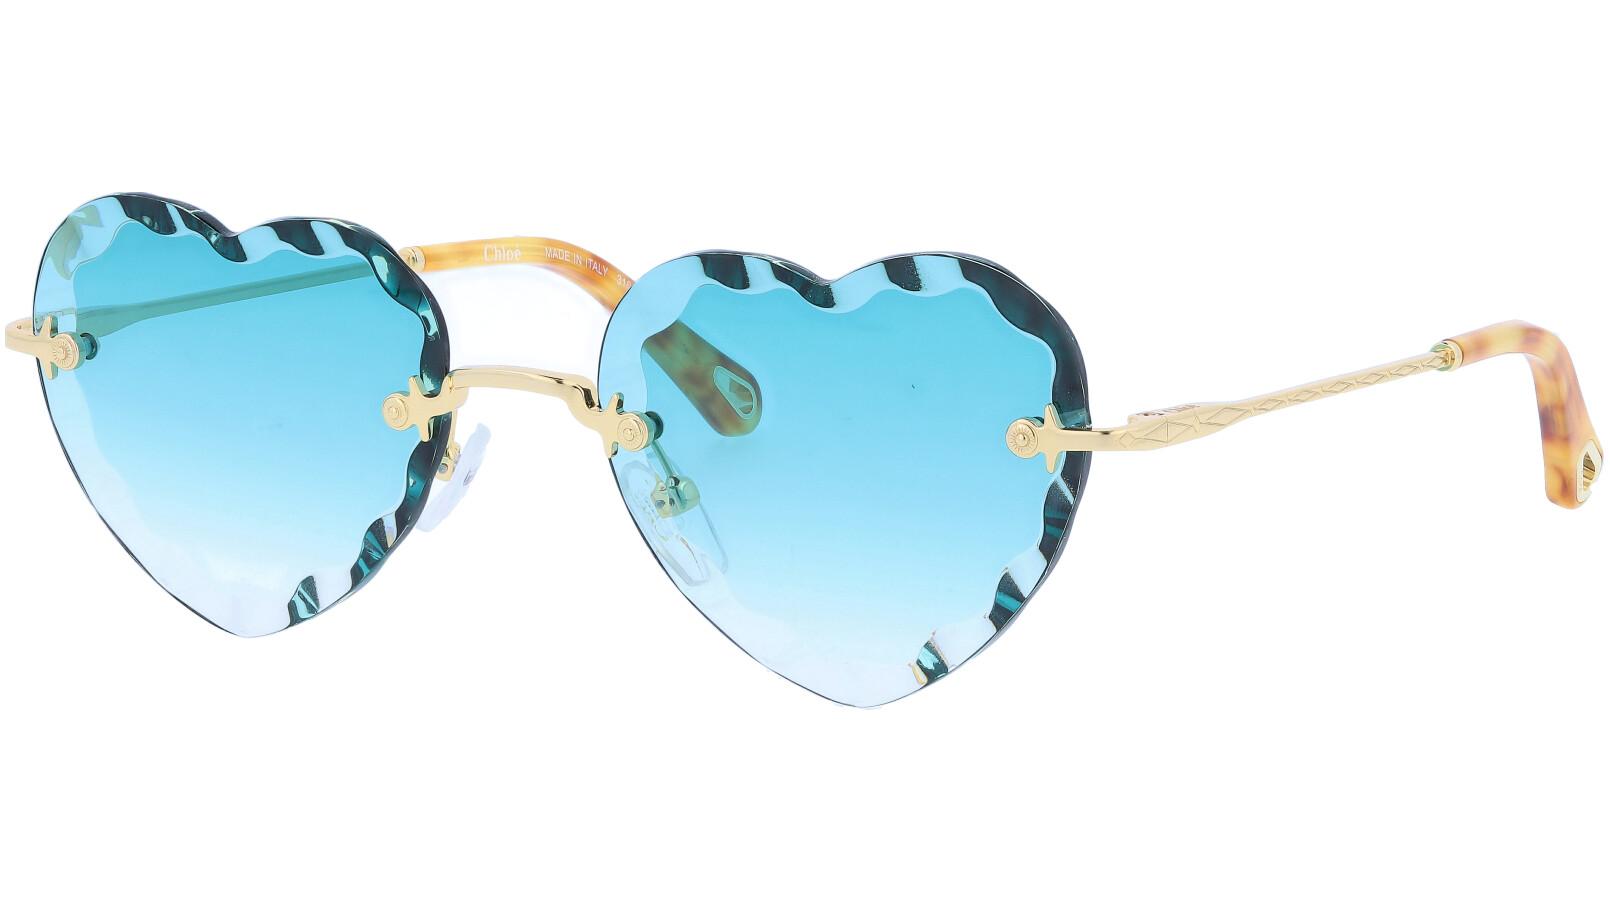 Chloé Rosie CE150S 839 55 Gold Blue Sunglasses